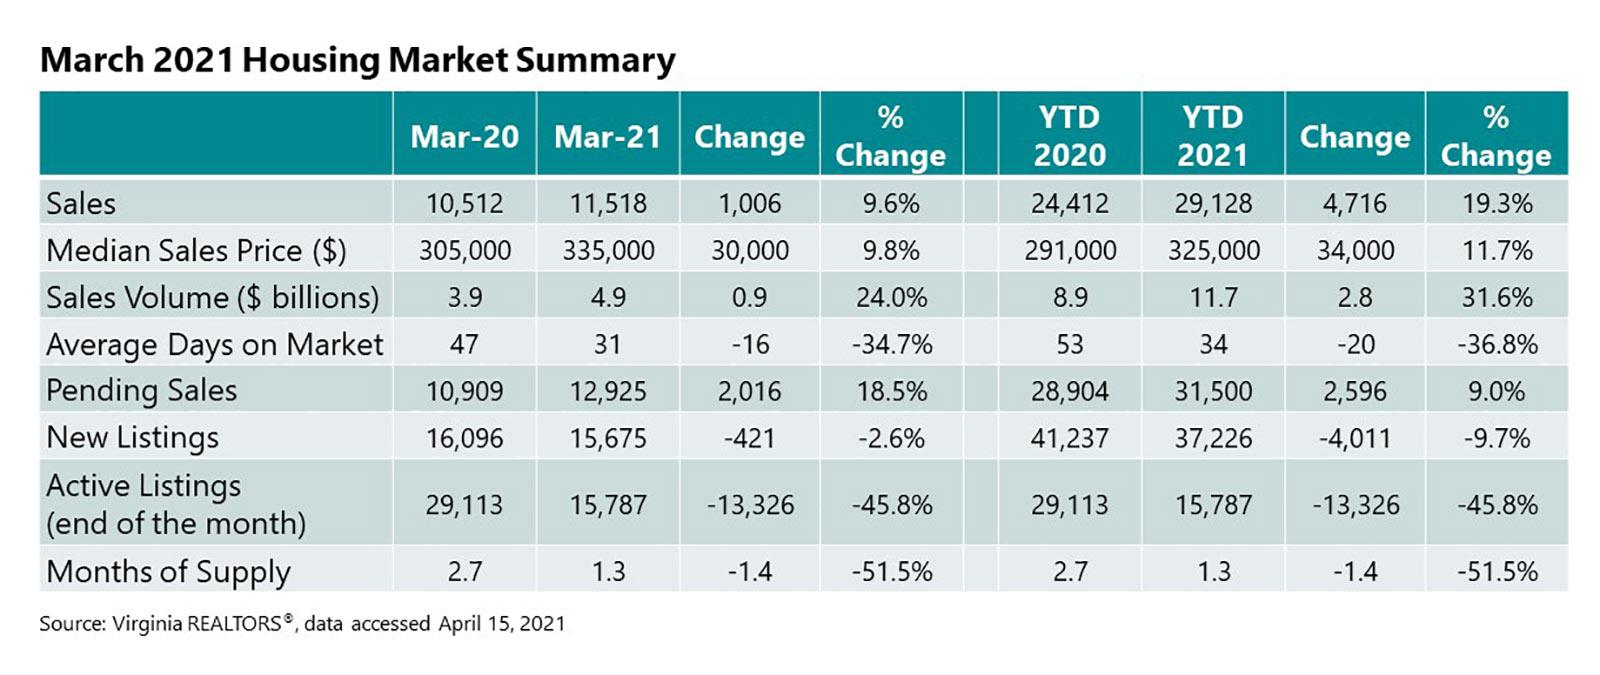 March 2021 Housing Market Summary